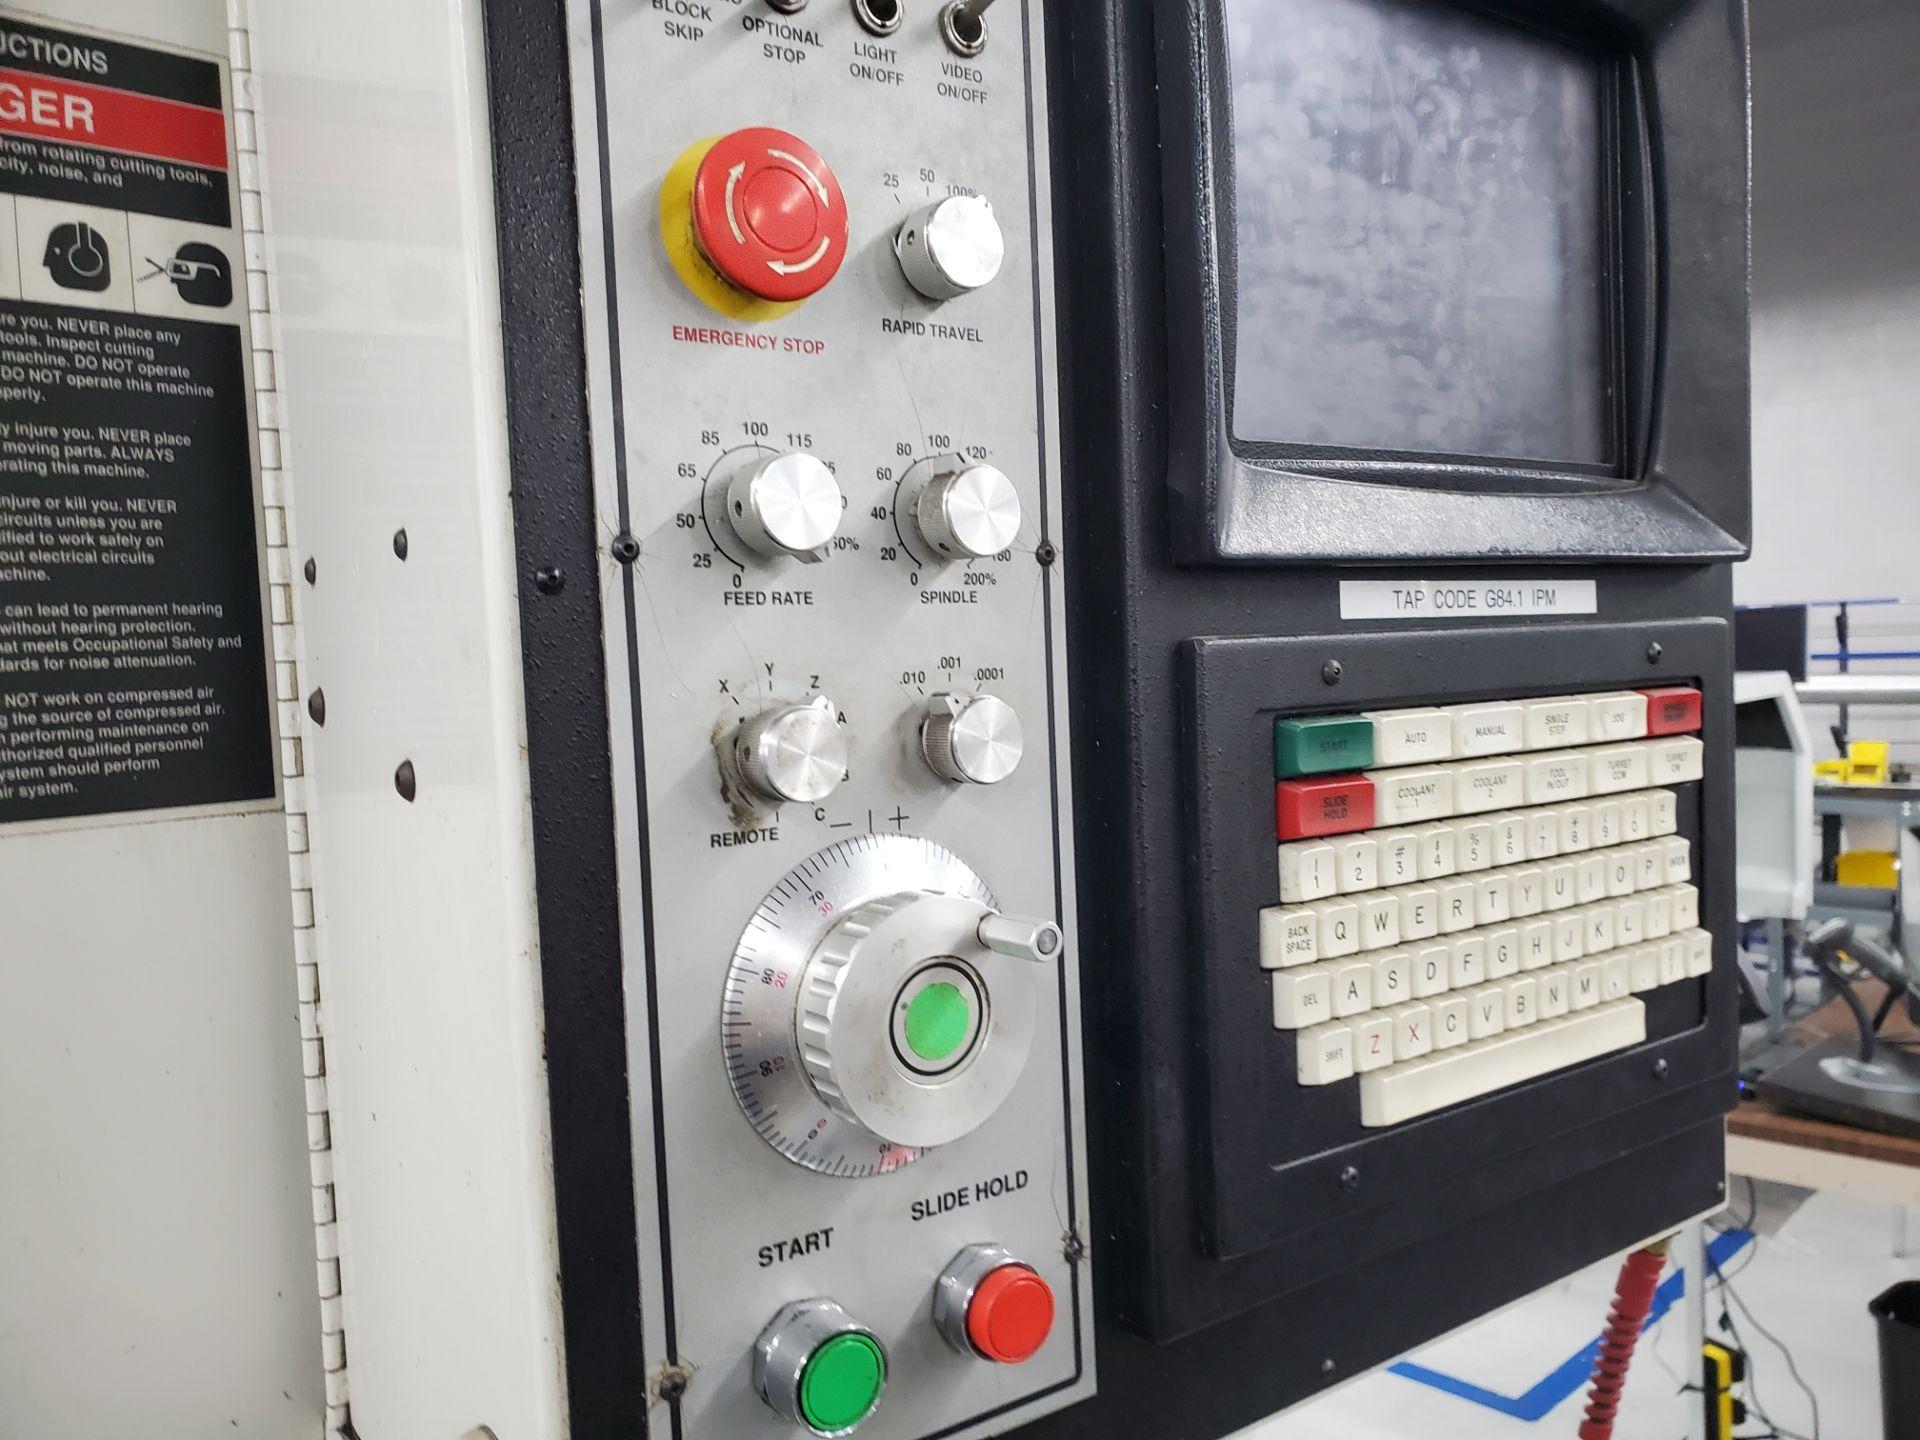 Fadal CNC Vertical Machining Center Model 4020 - Image 16 of 18